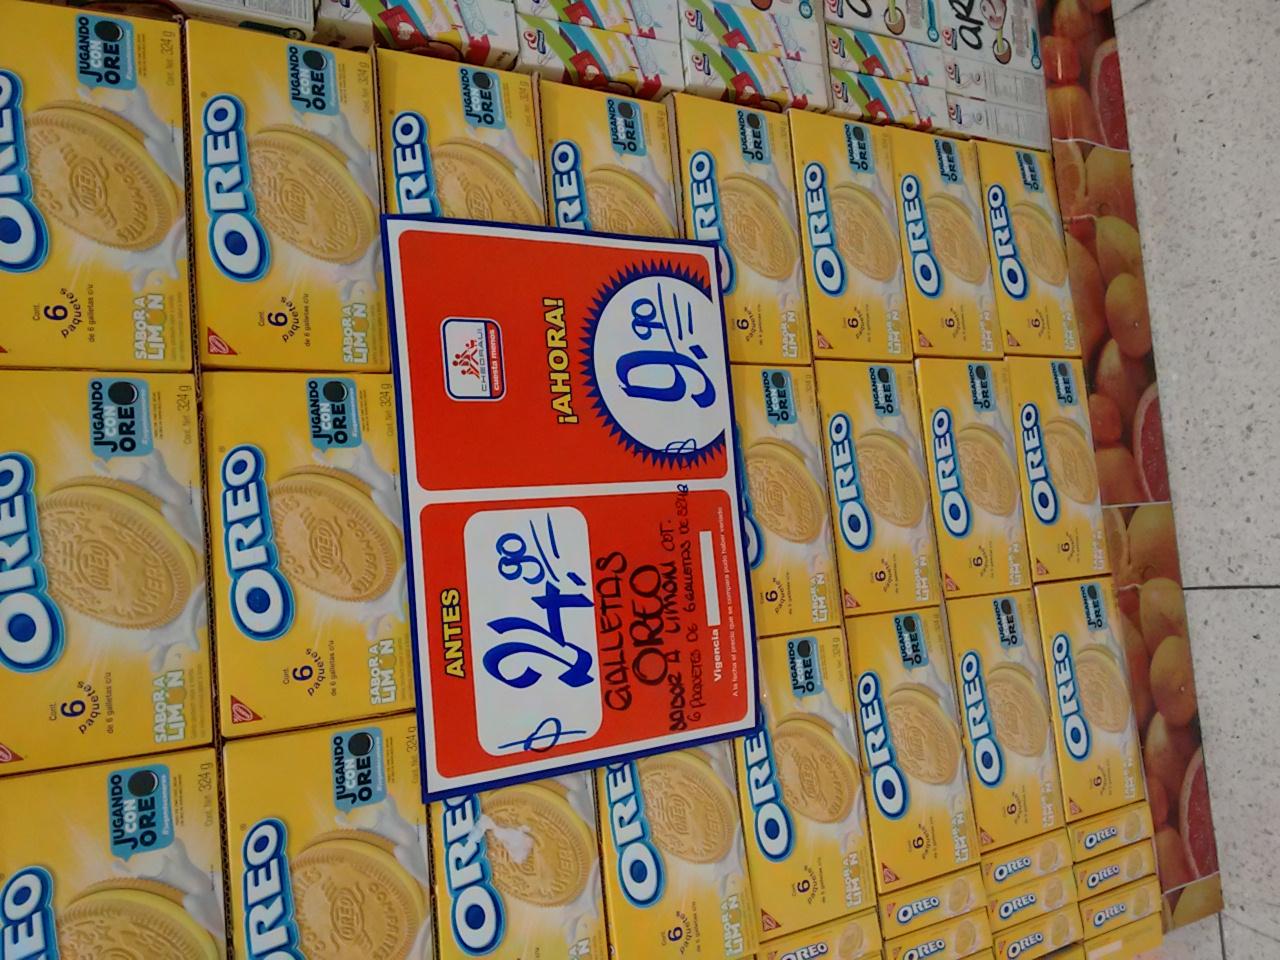 Chedraui: Galleta Oreo sabor limon a $9.90